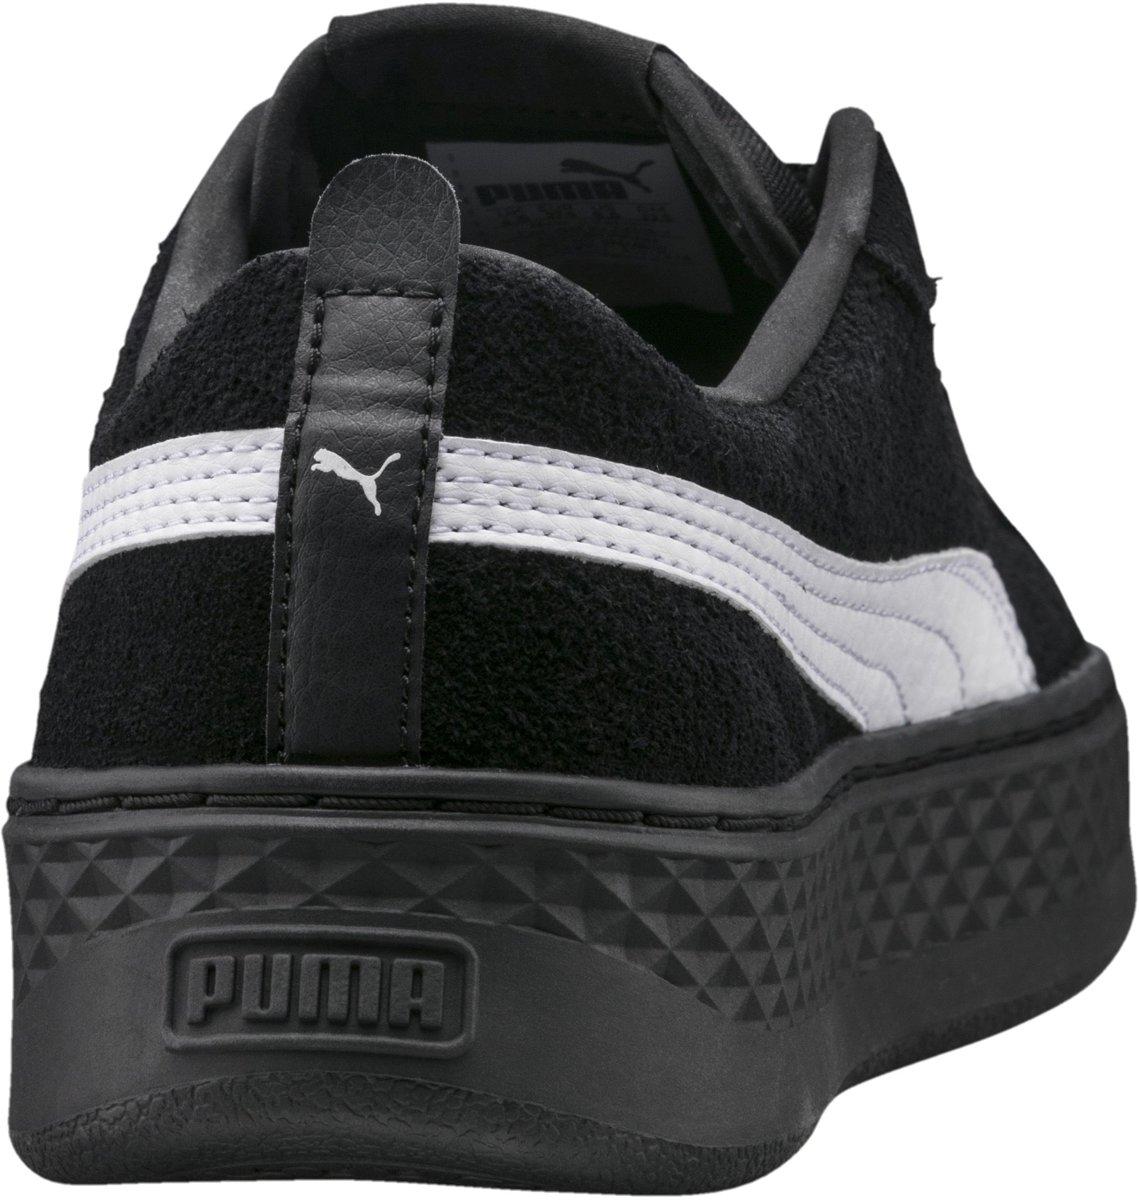 PUMA Smash Platform Sd Sneakers Dames Puma Black Puma White Maat 40